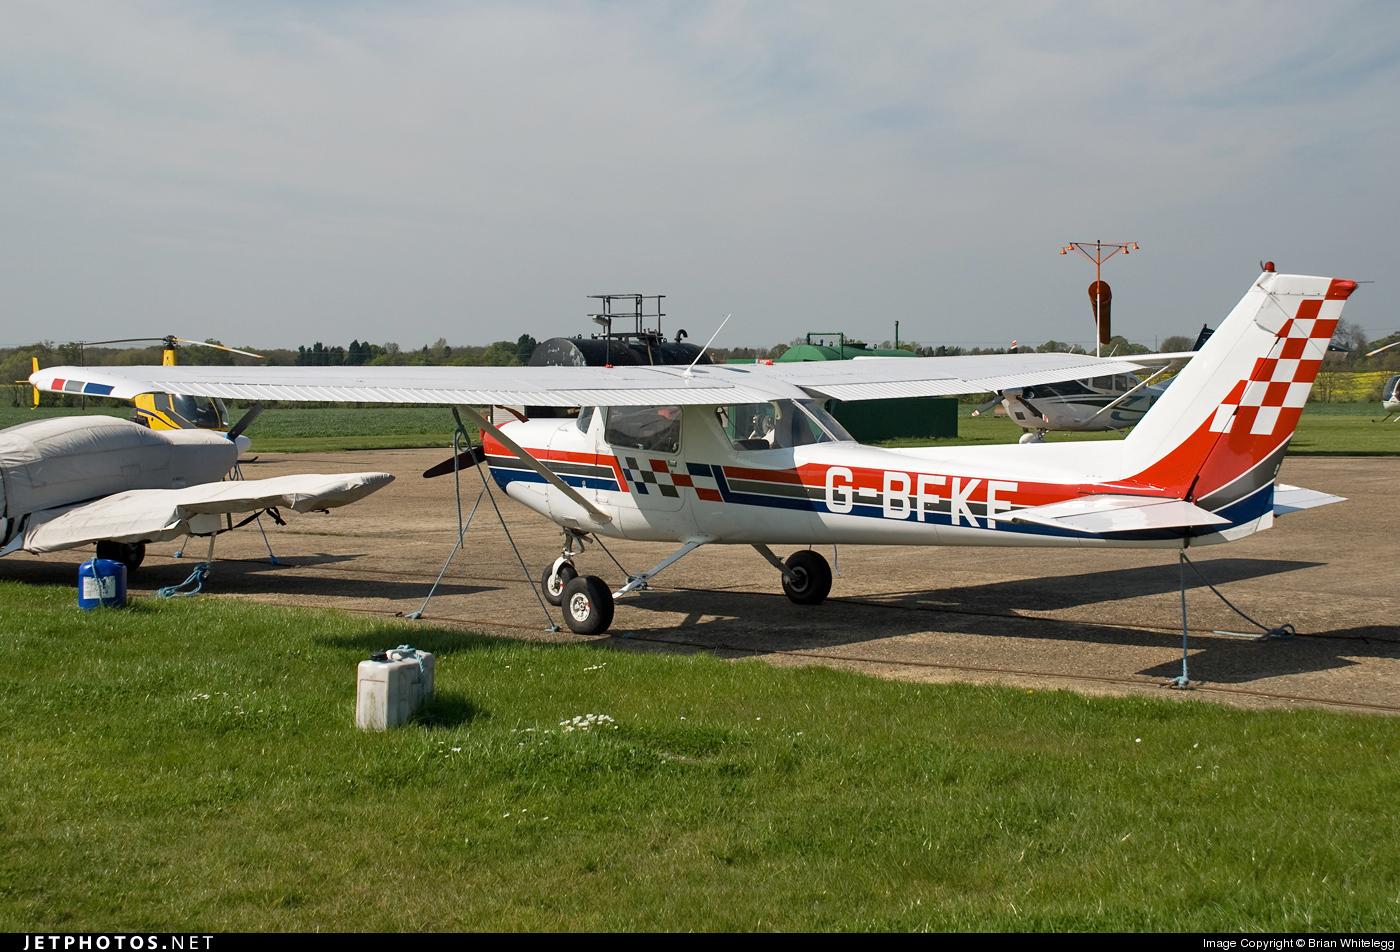 G-BFKF - Cessna A152 Aerobat - Private